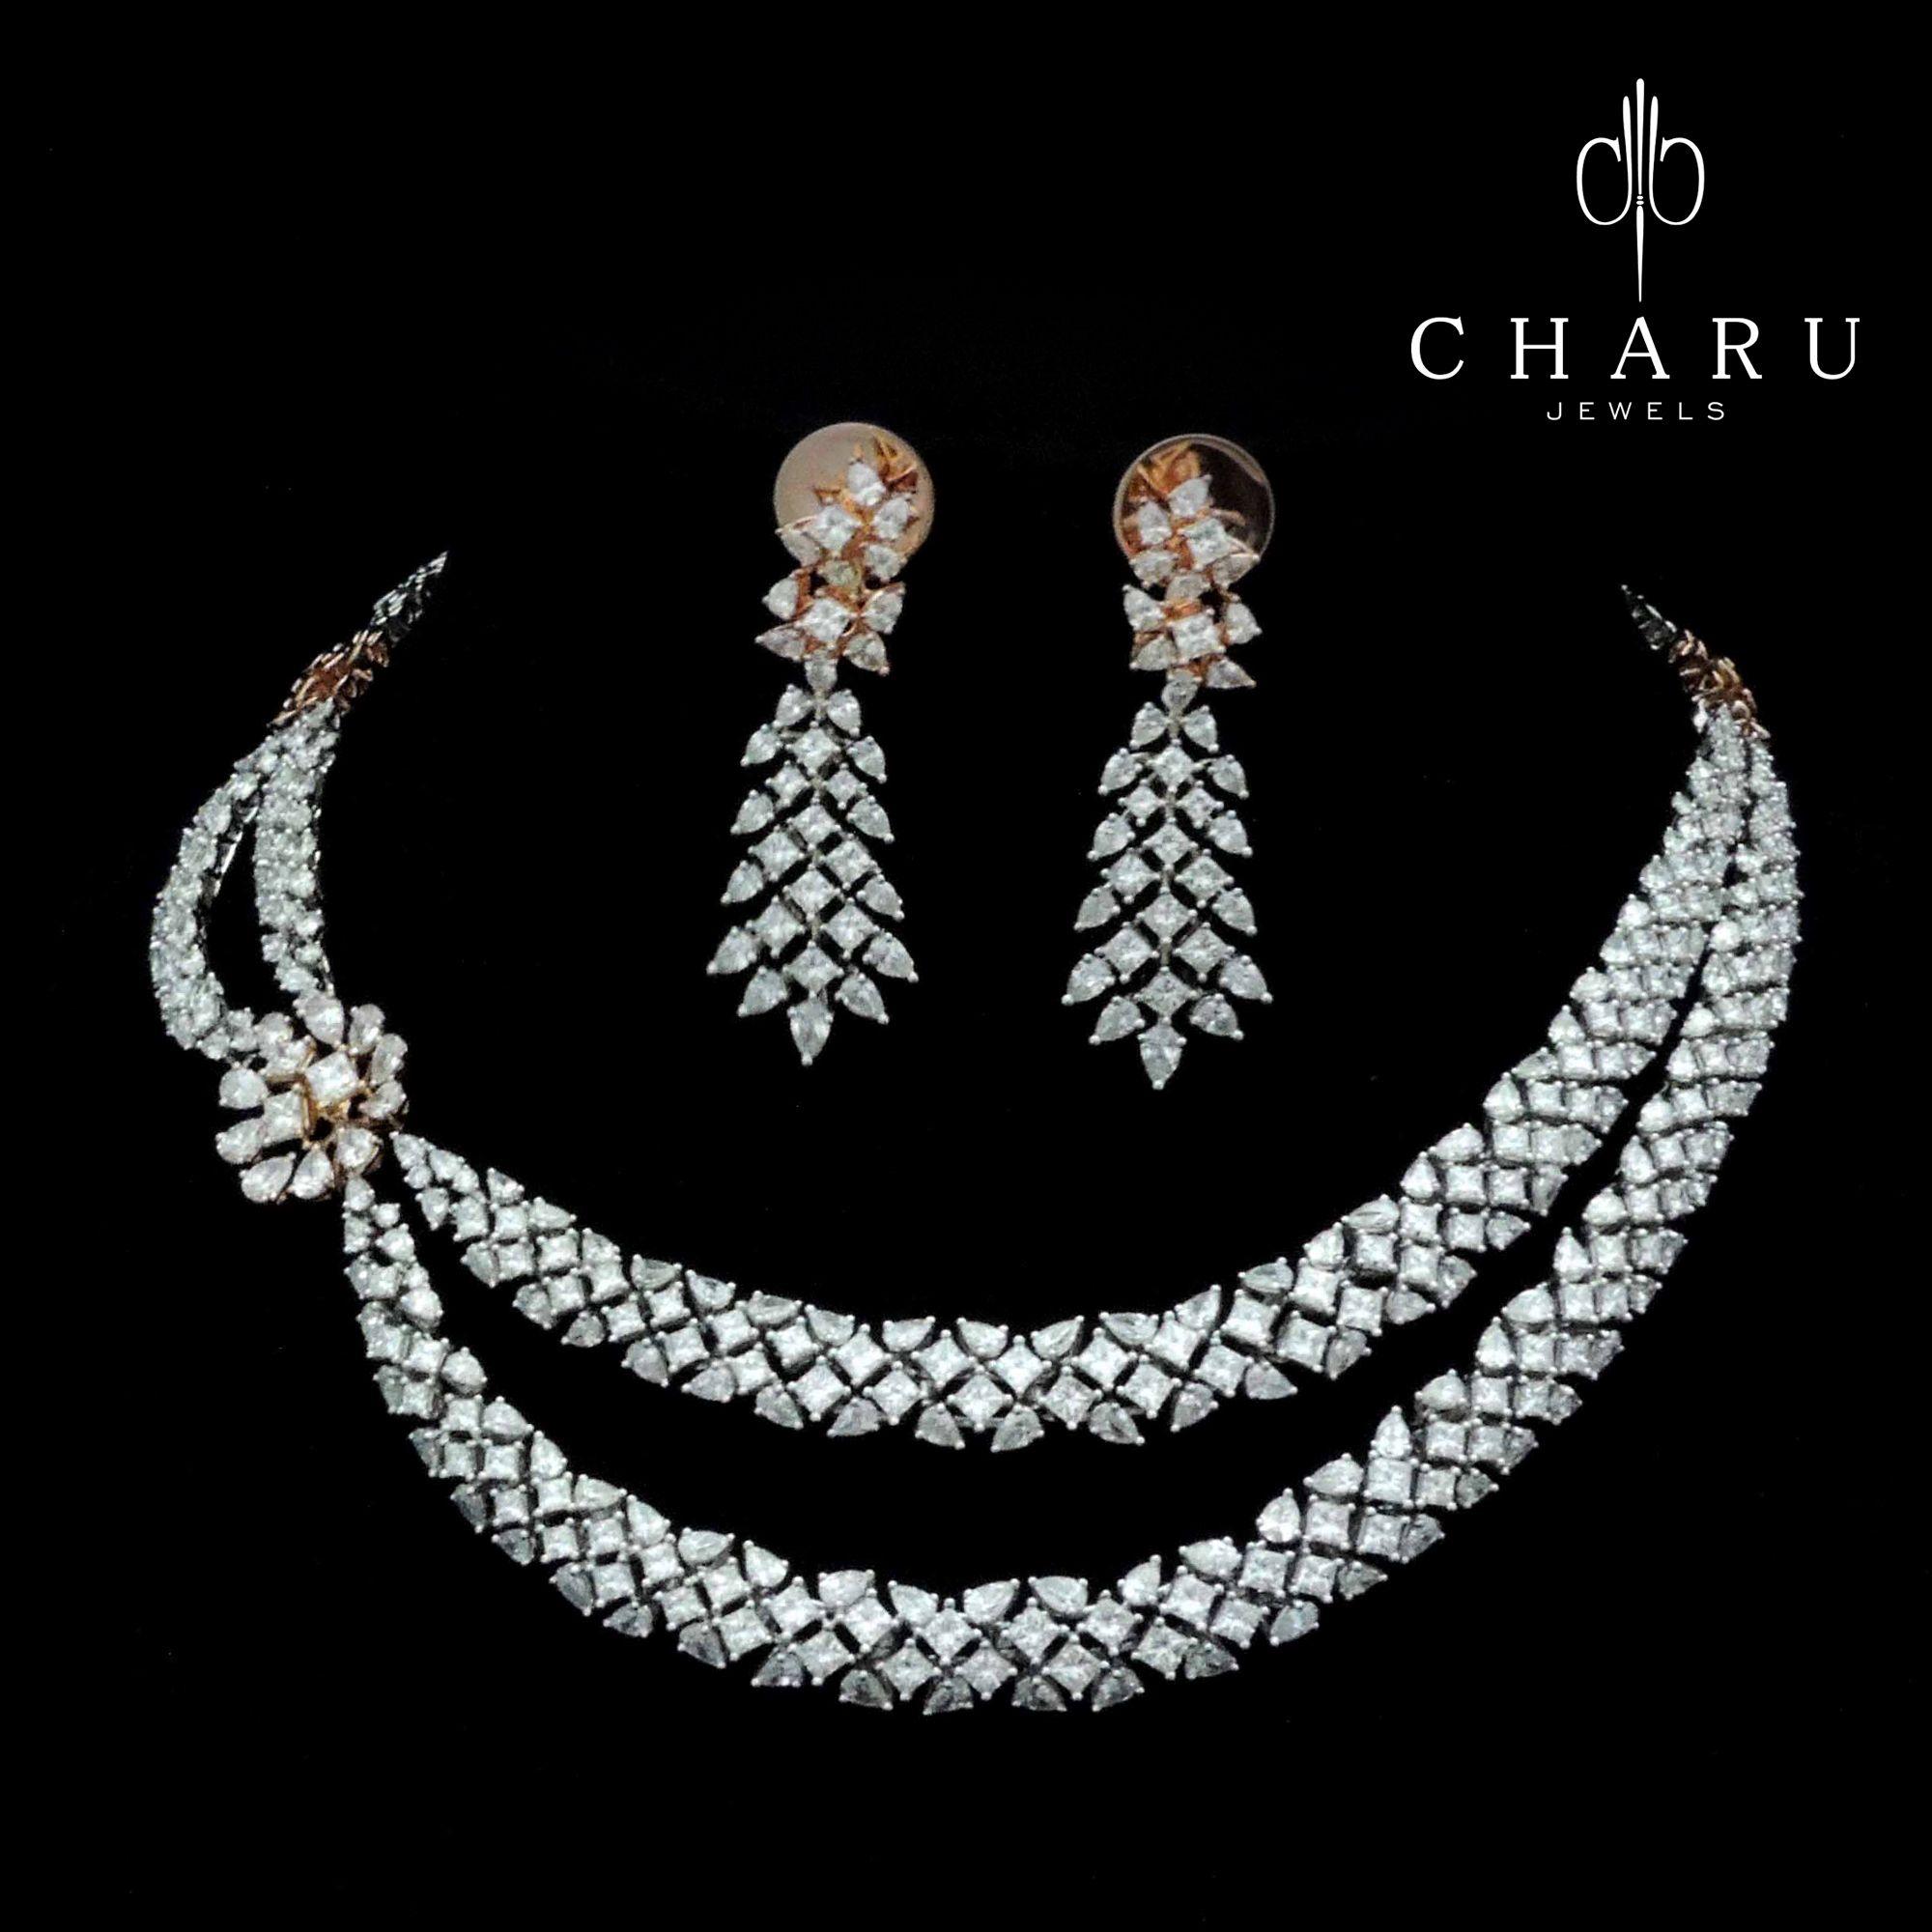 Bridal classics necklace sets mj 259 -  Traditional Indian Diamond Jewelery From Charu Jewels Exclusive Indian Wedding Jewelrywedding Jewelry Setsindian